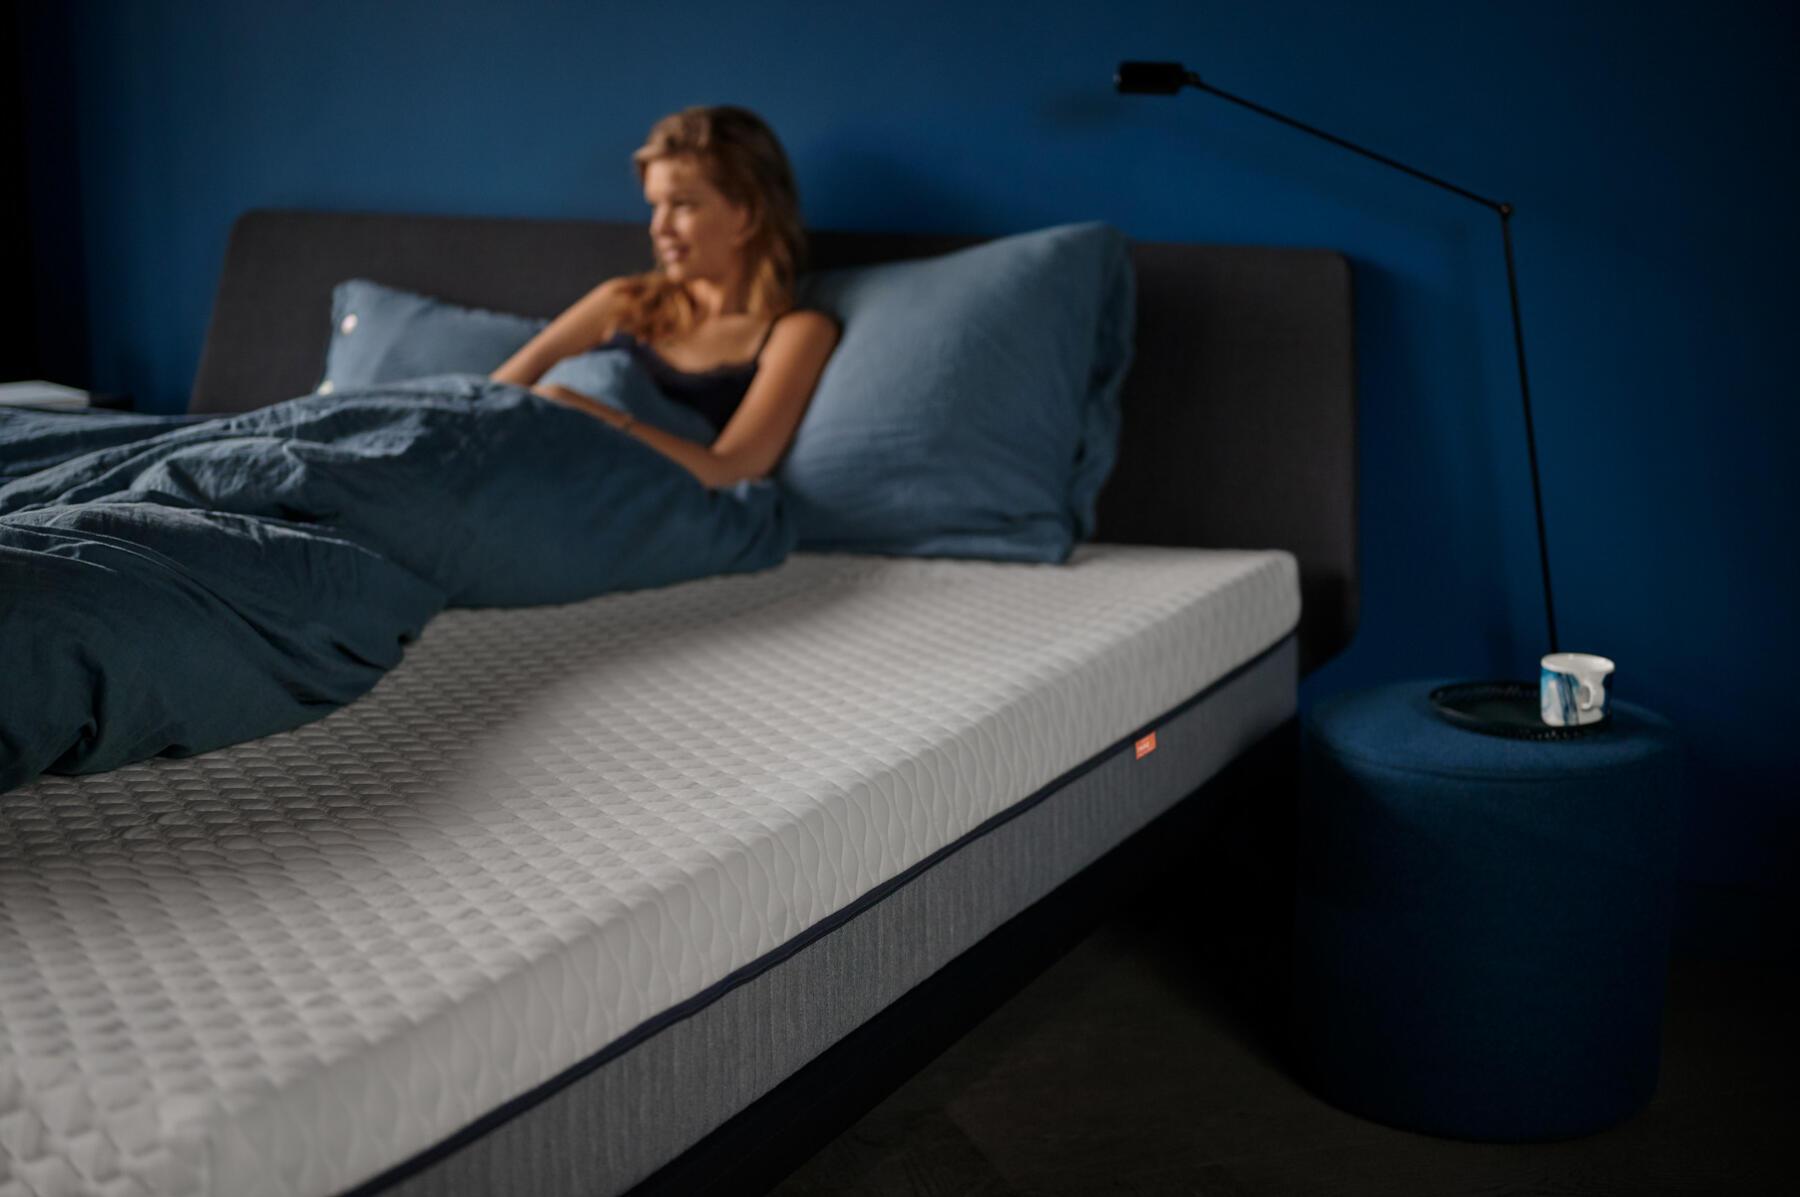 auping evolve matras gasse slaapcomfort sfeer